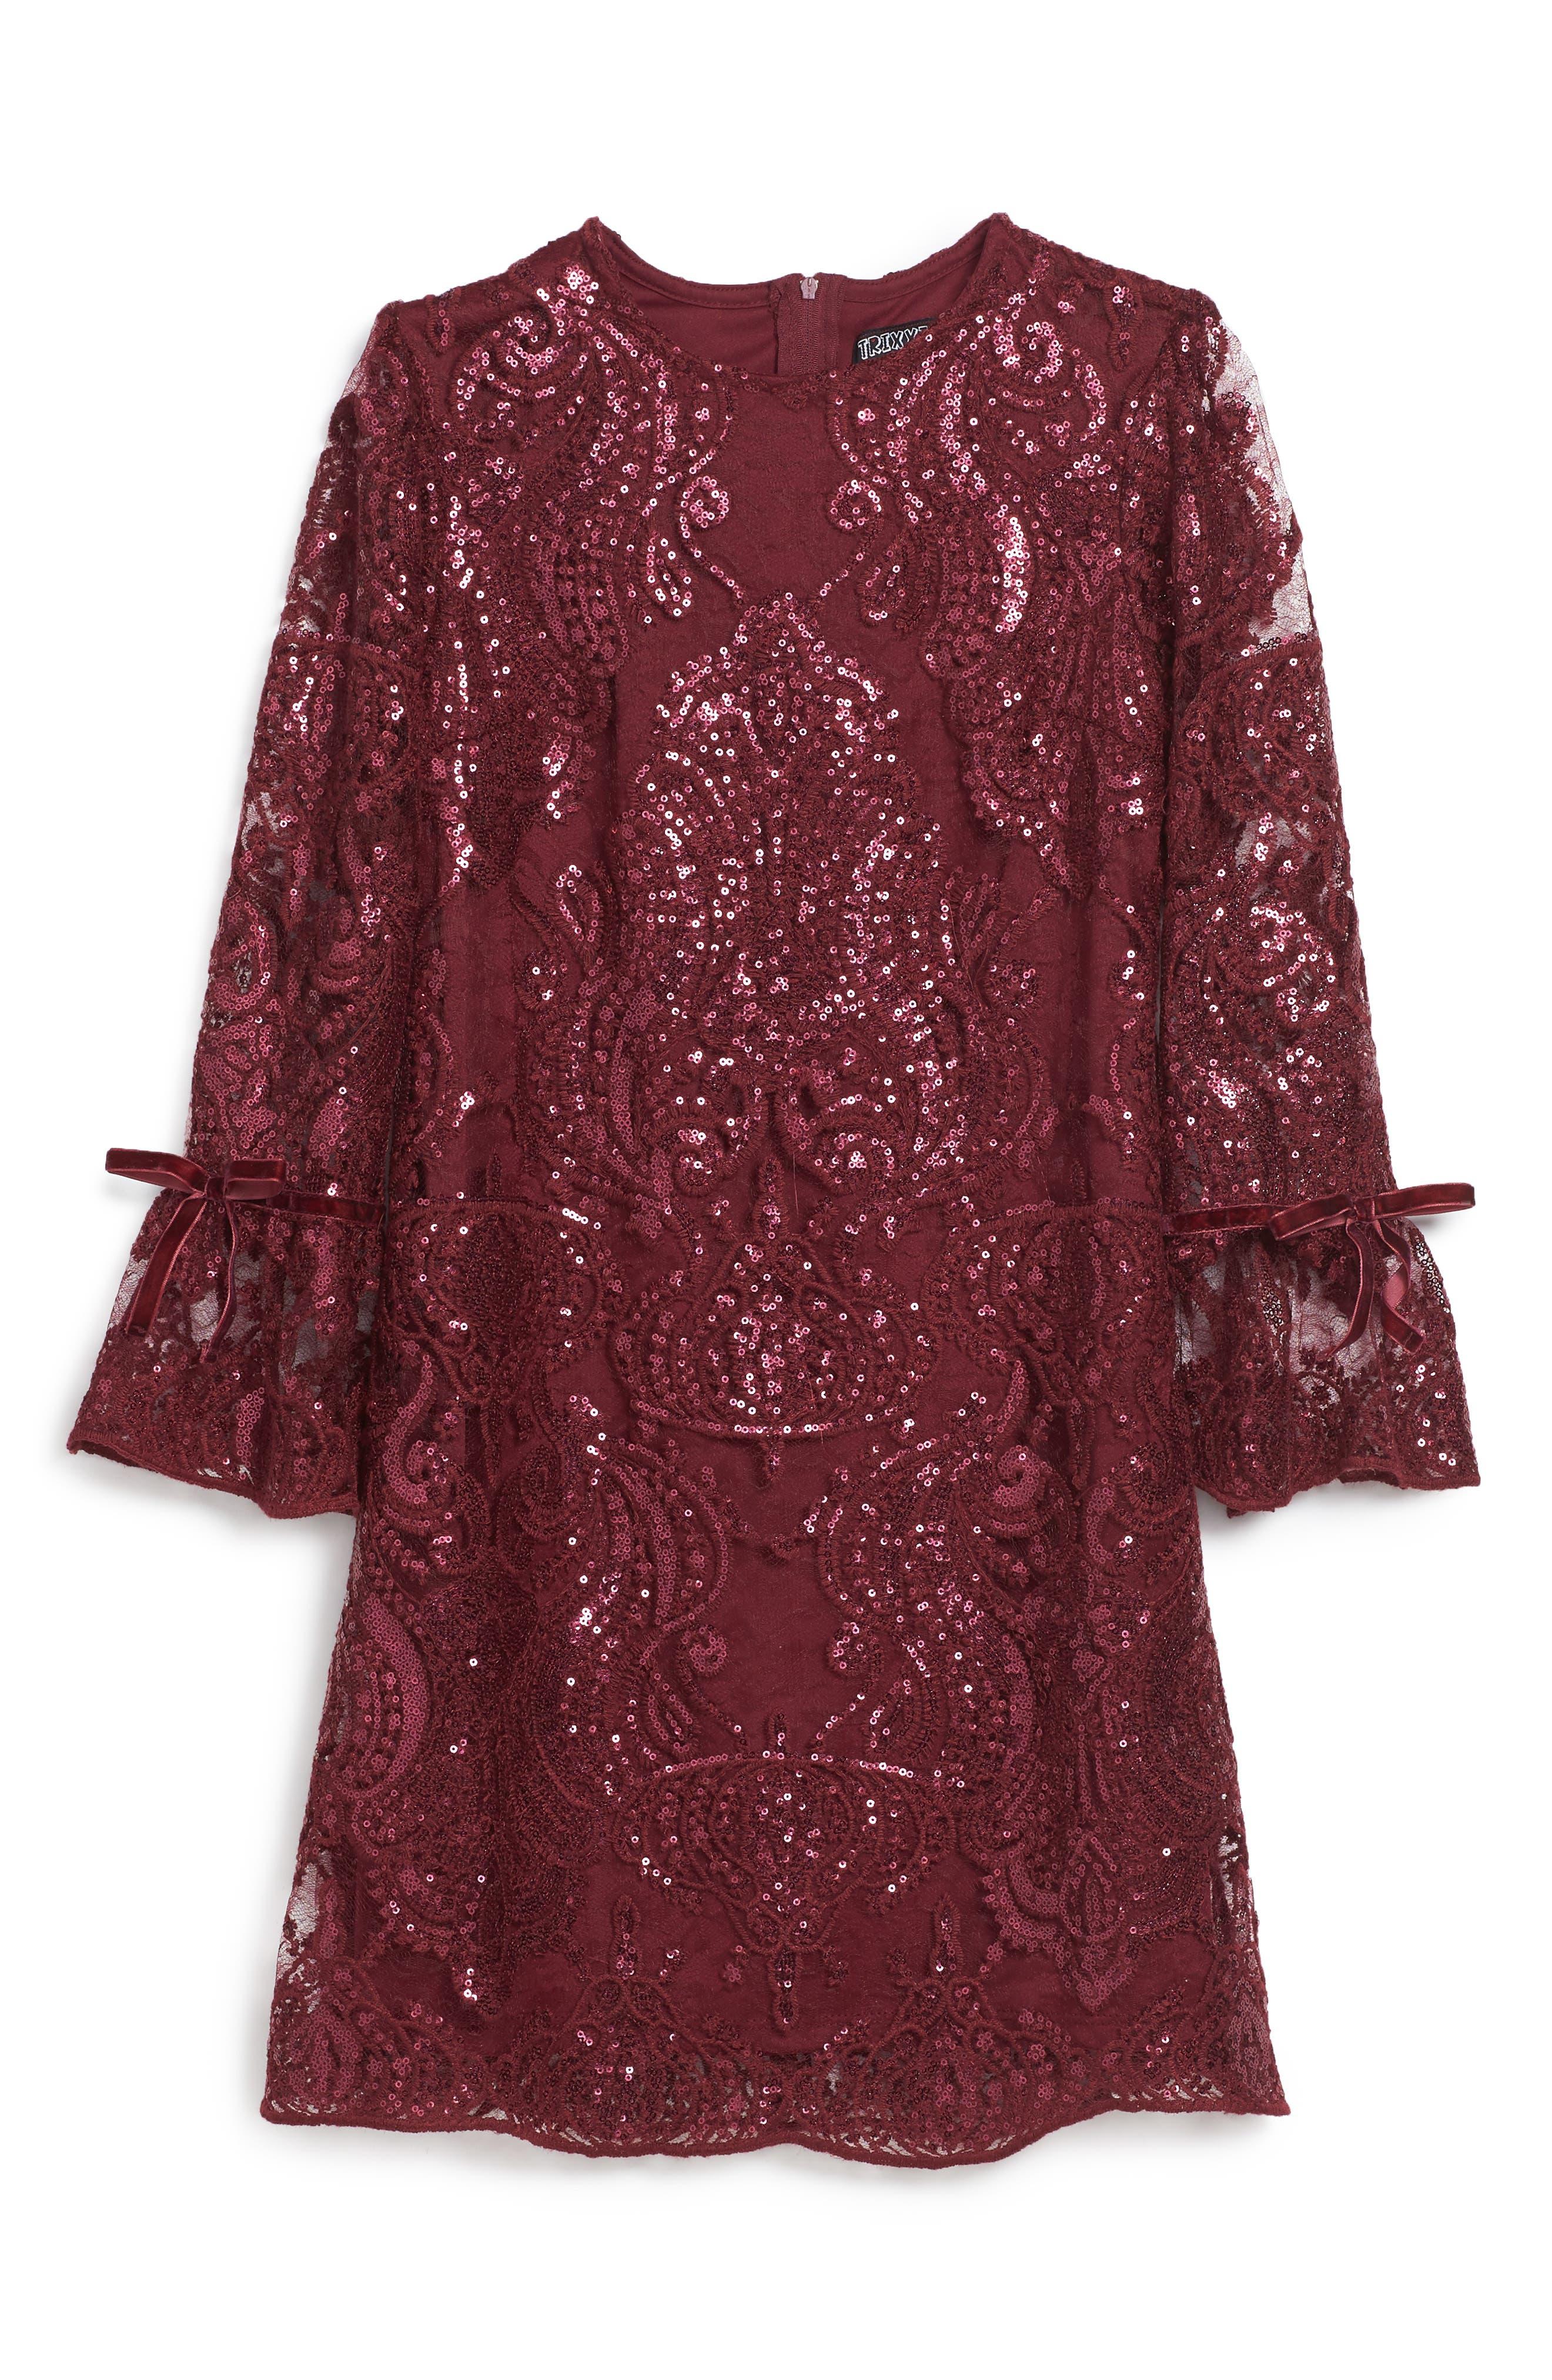 Alternate Image 1 Selected - Trixxi Scalloped Sequin Embellished Shift Dress (Big Girls)